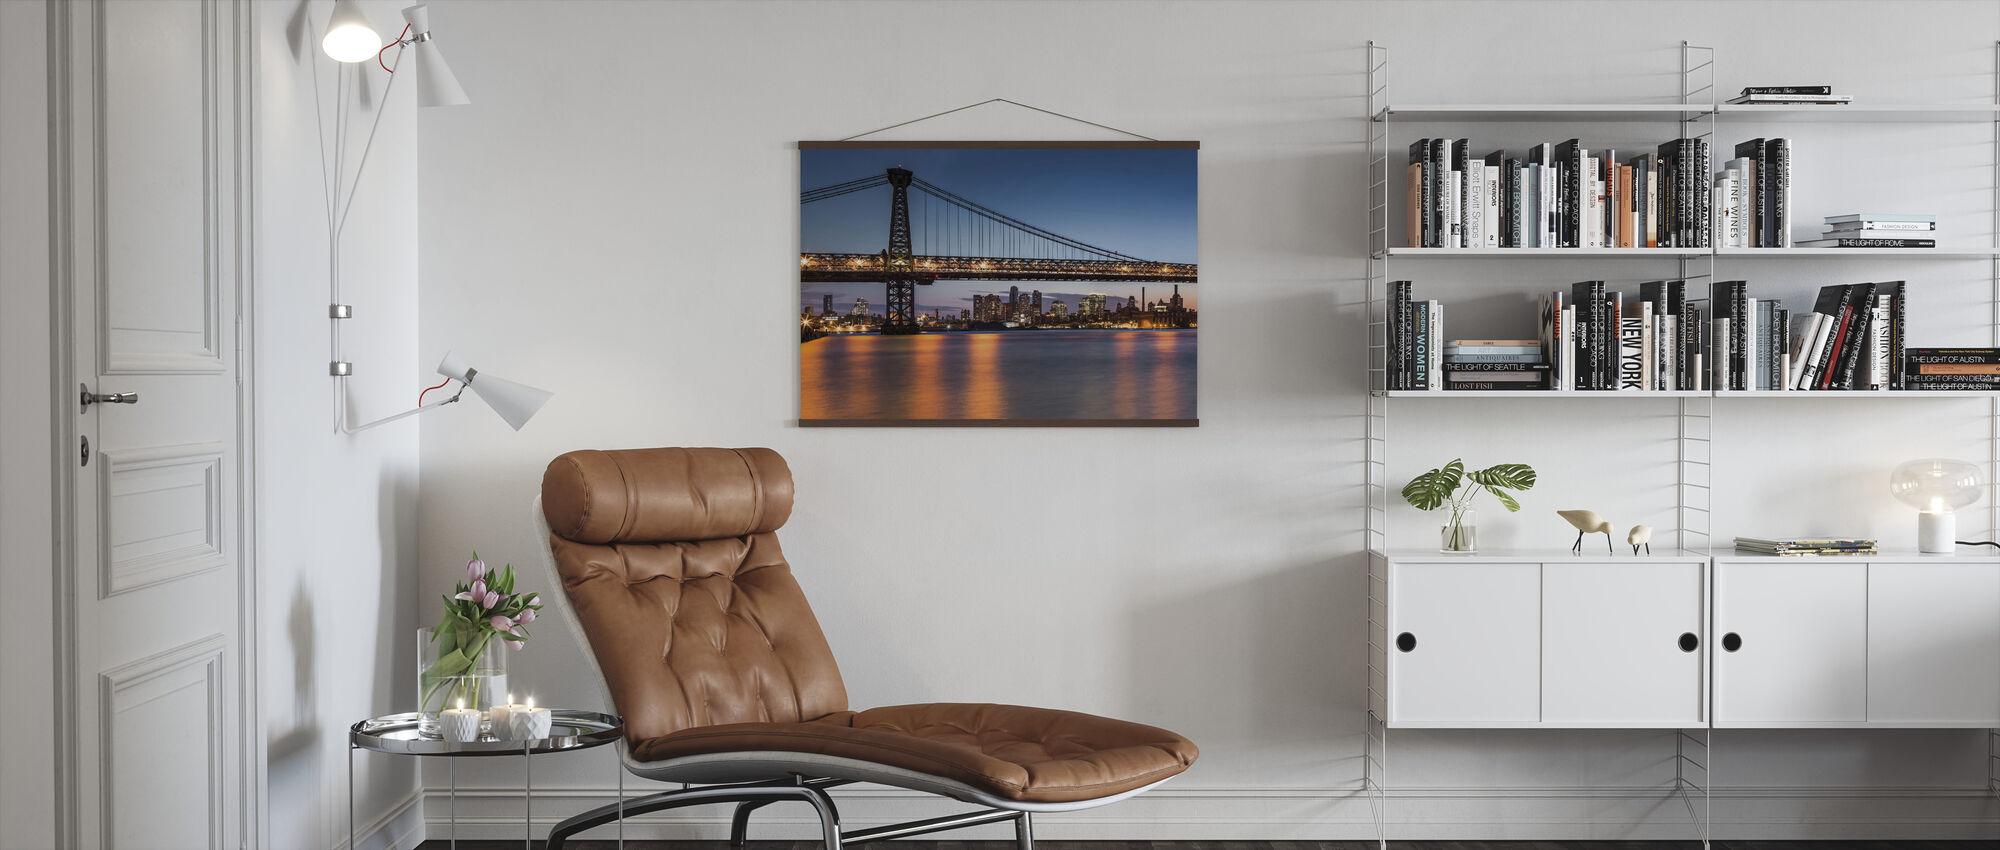 Williamsburg Bridge at Dusk - Poster - Living Room